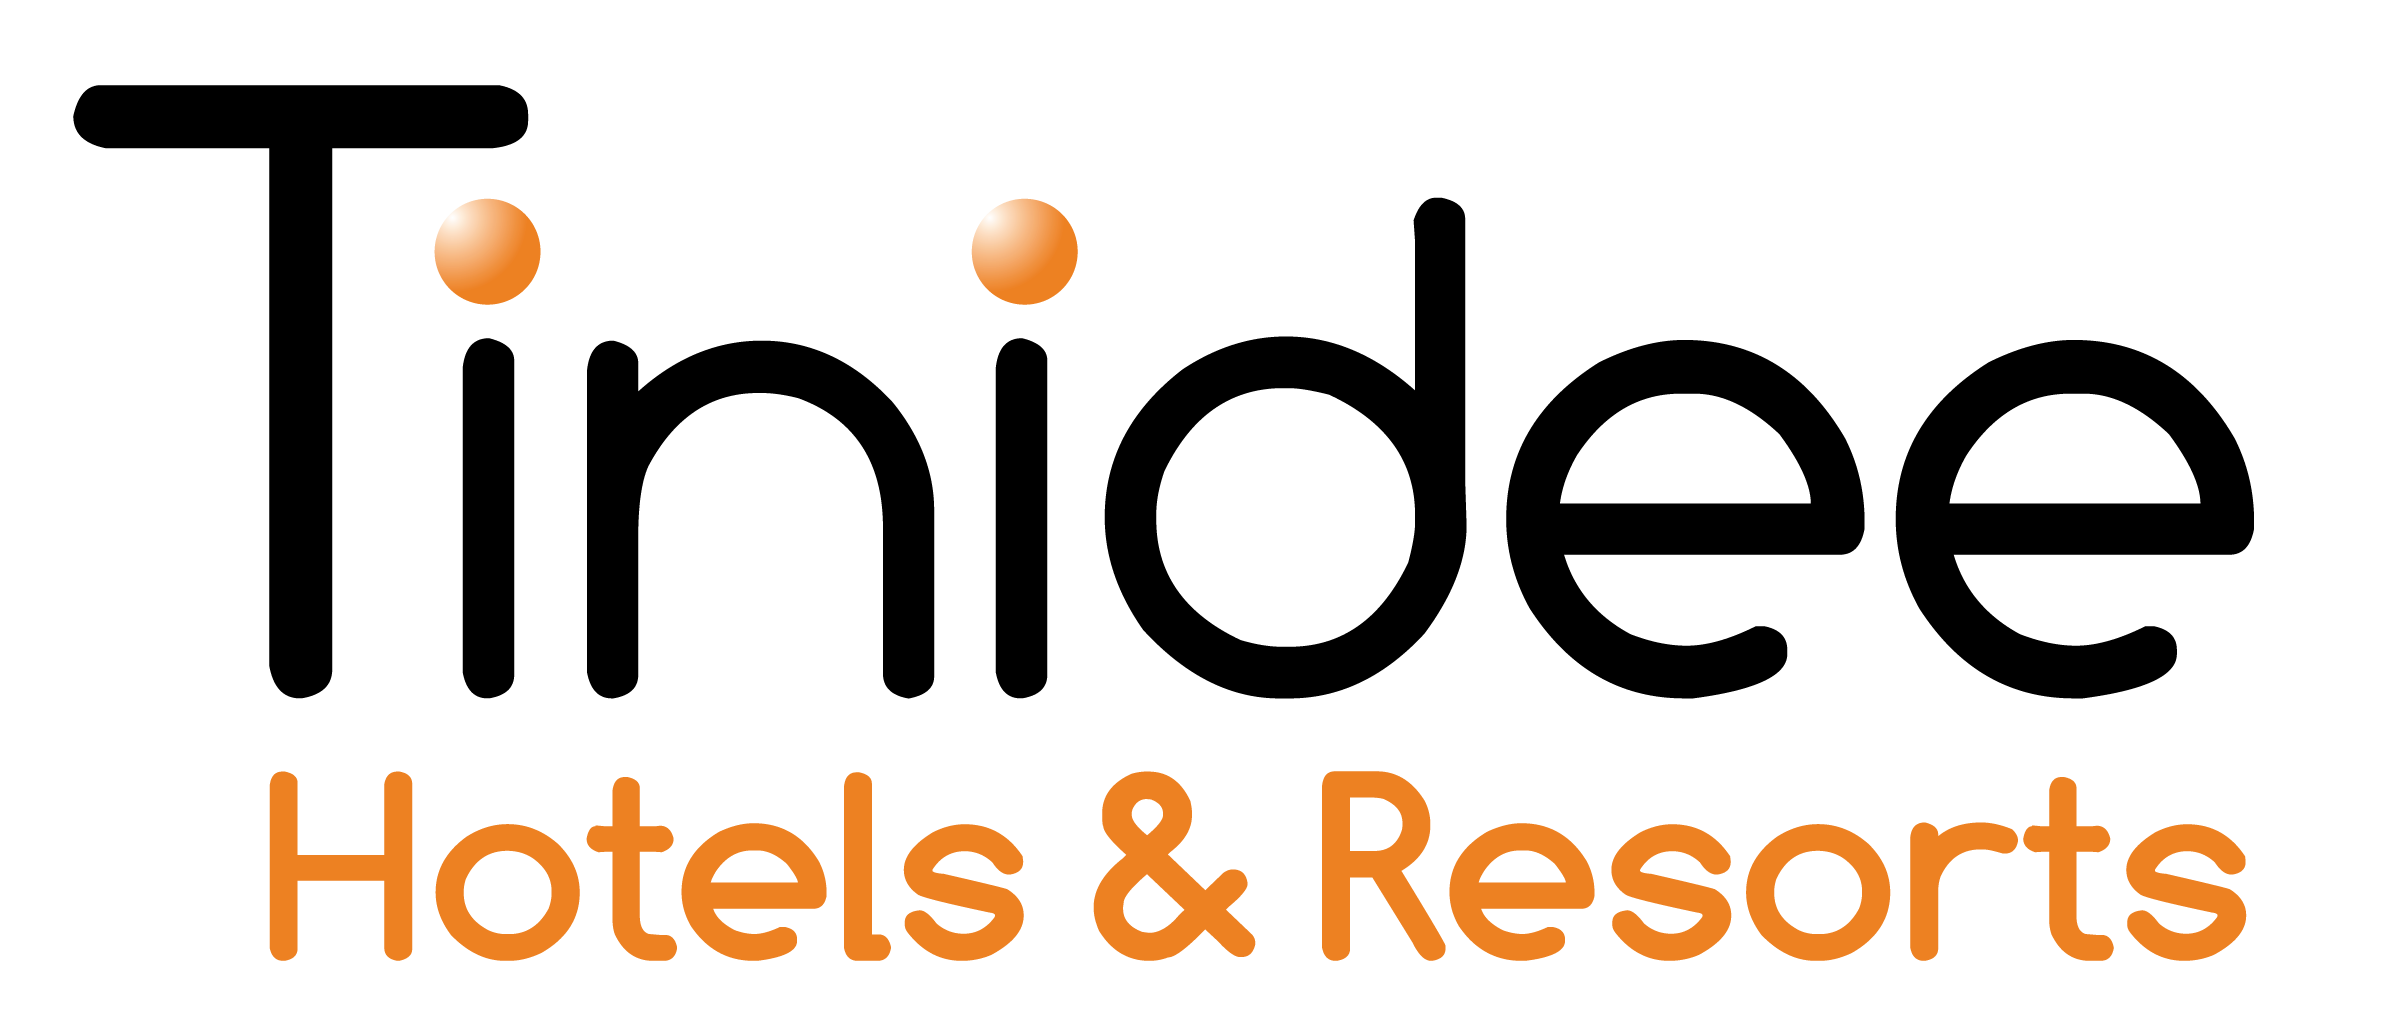 Tinidee Hotels & Resorts